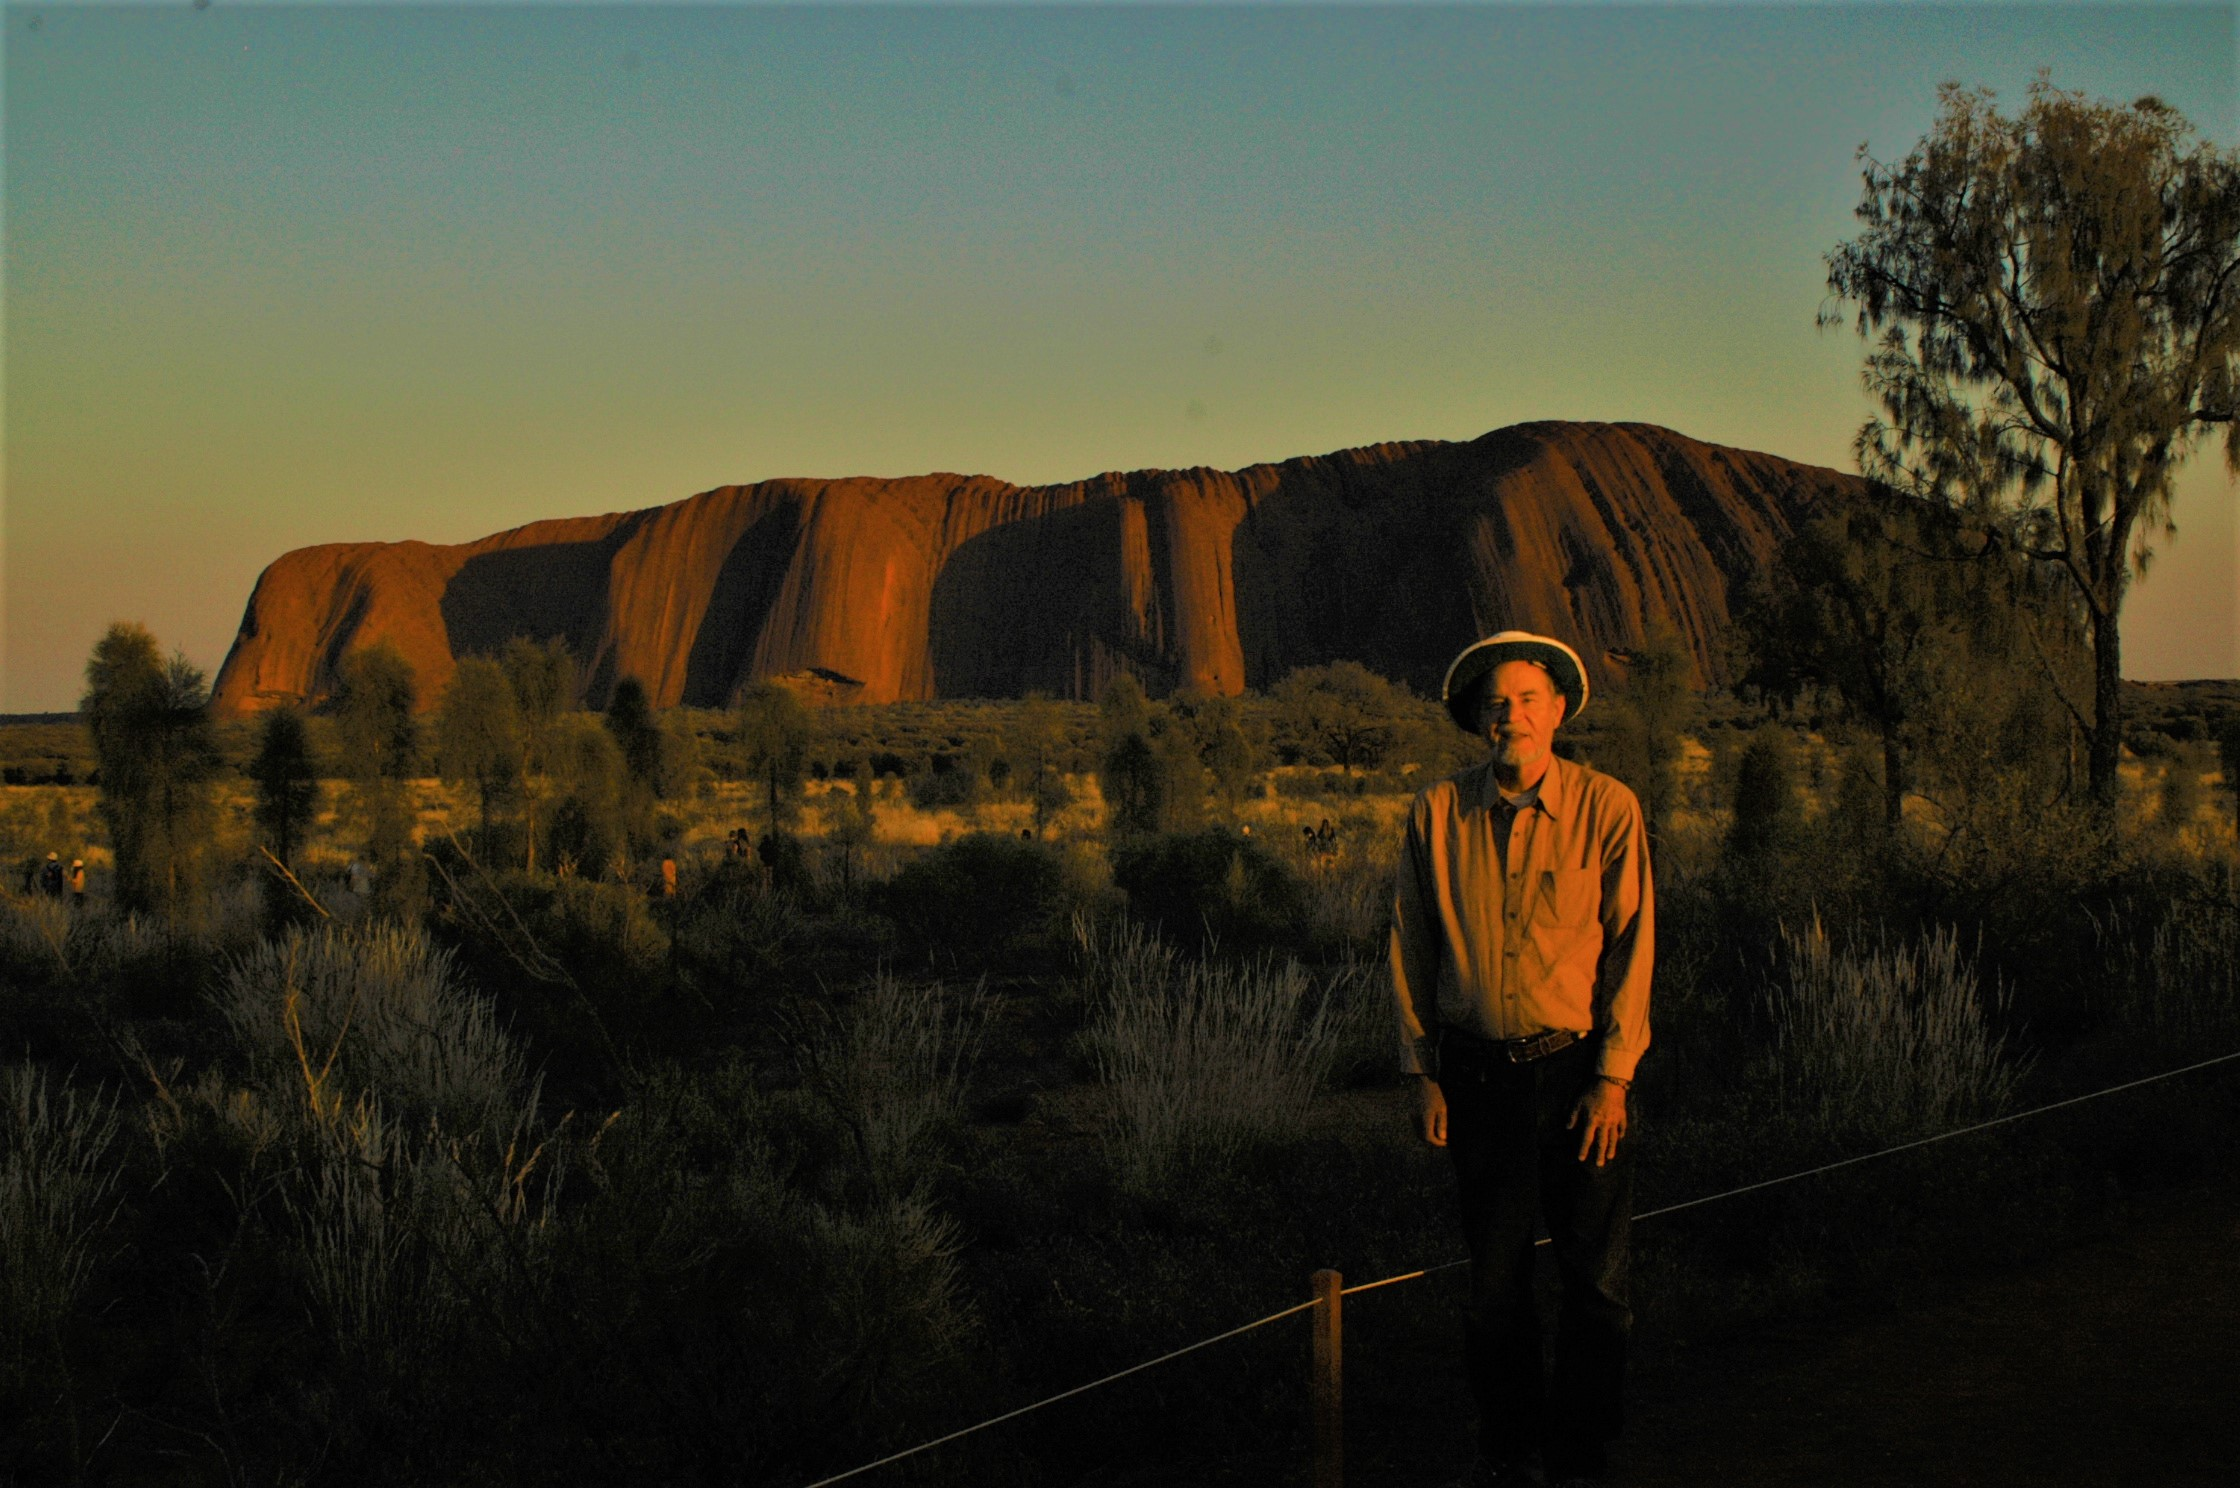 Craig C Downer at Uluru Rock N.T. Australia, sunrise late Oct 2014 by Mae Lee Sun